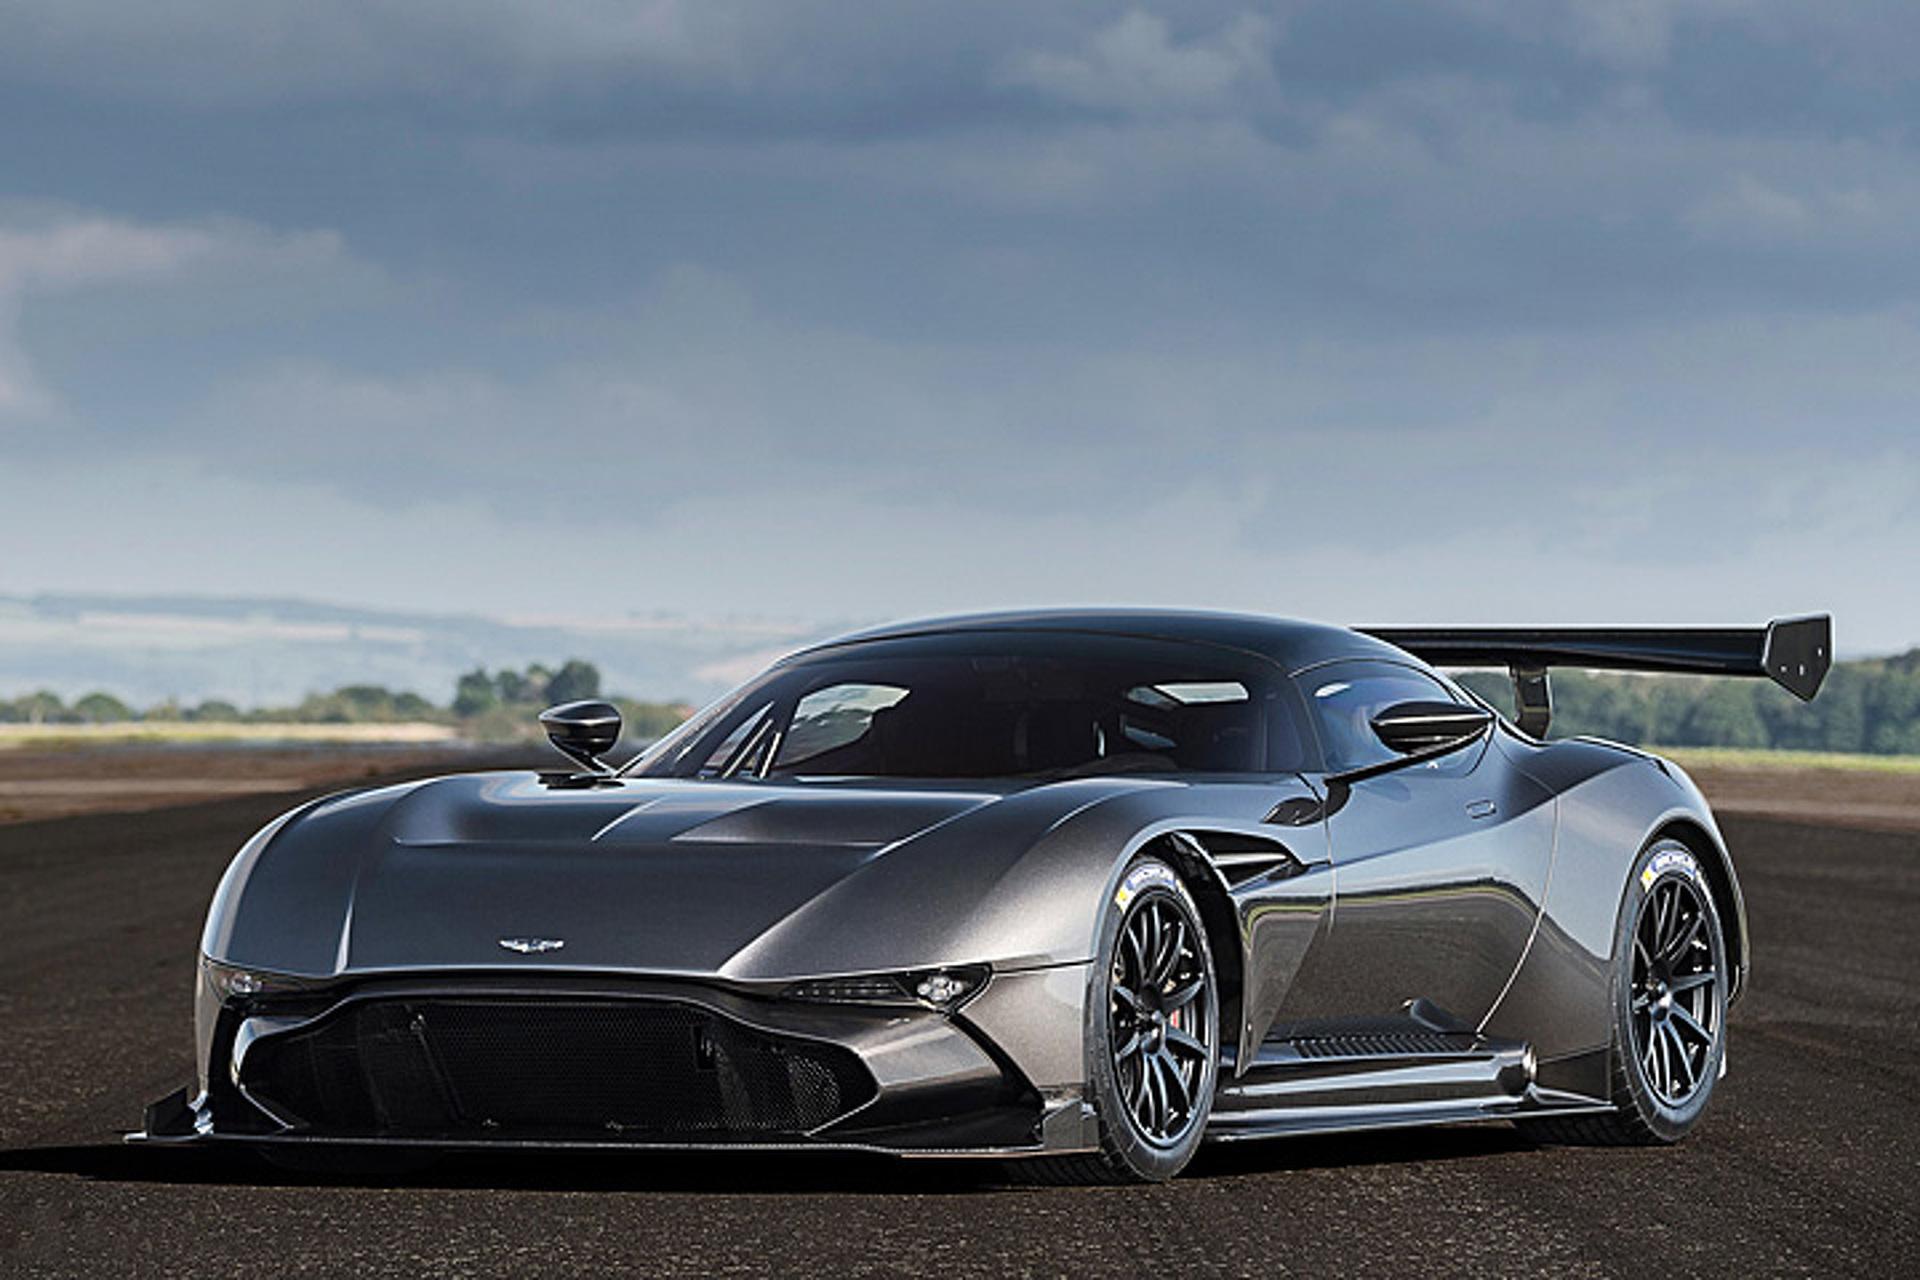 Go Behind the Scenes With $2 Million Aston Martin Vulcan Supercar